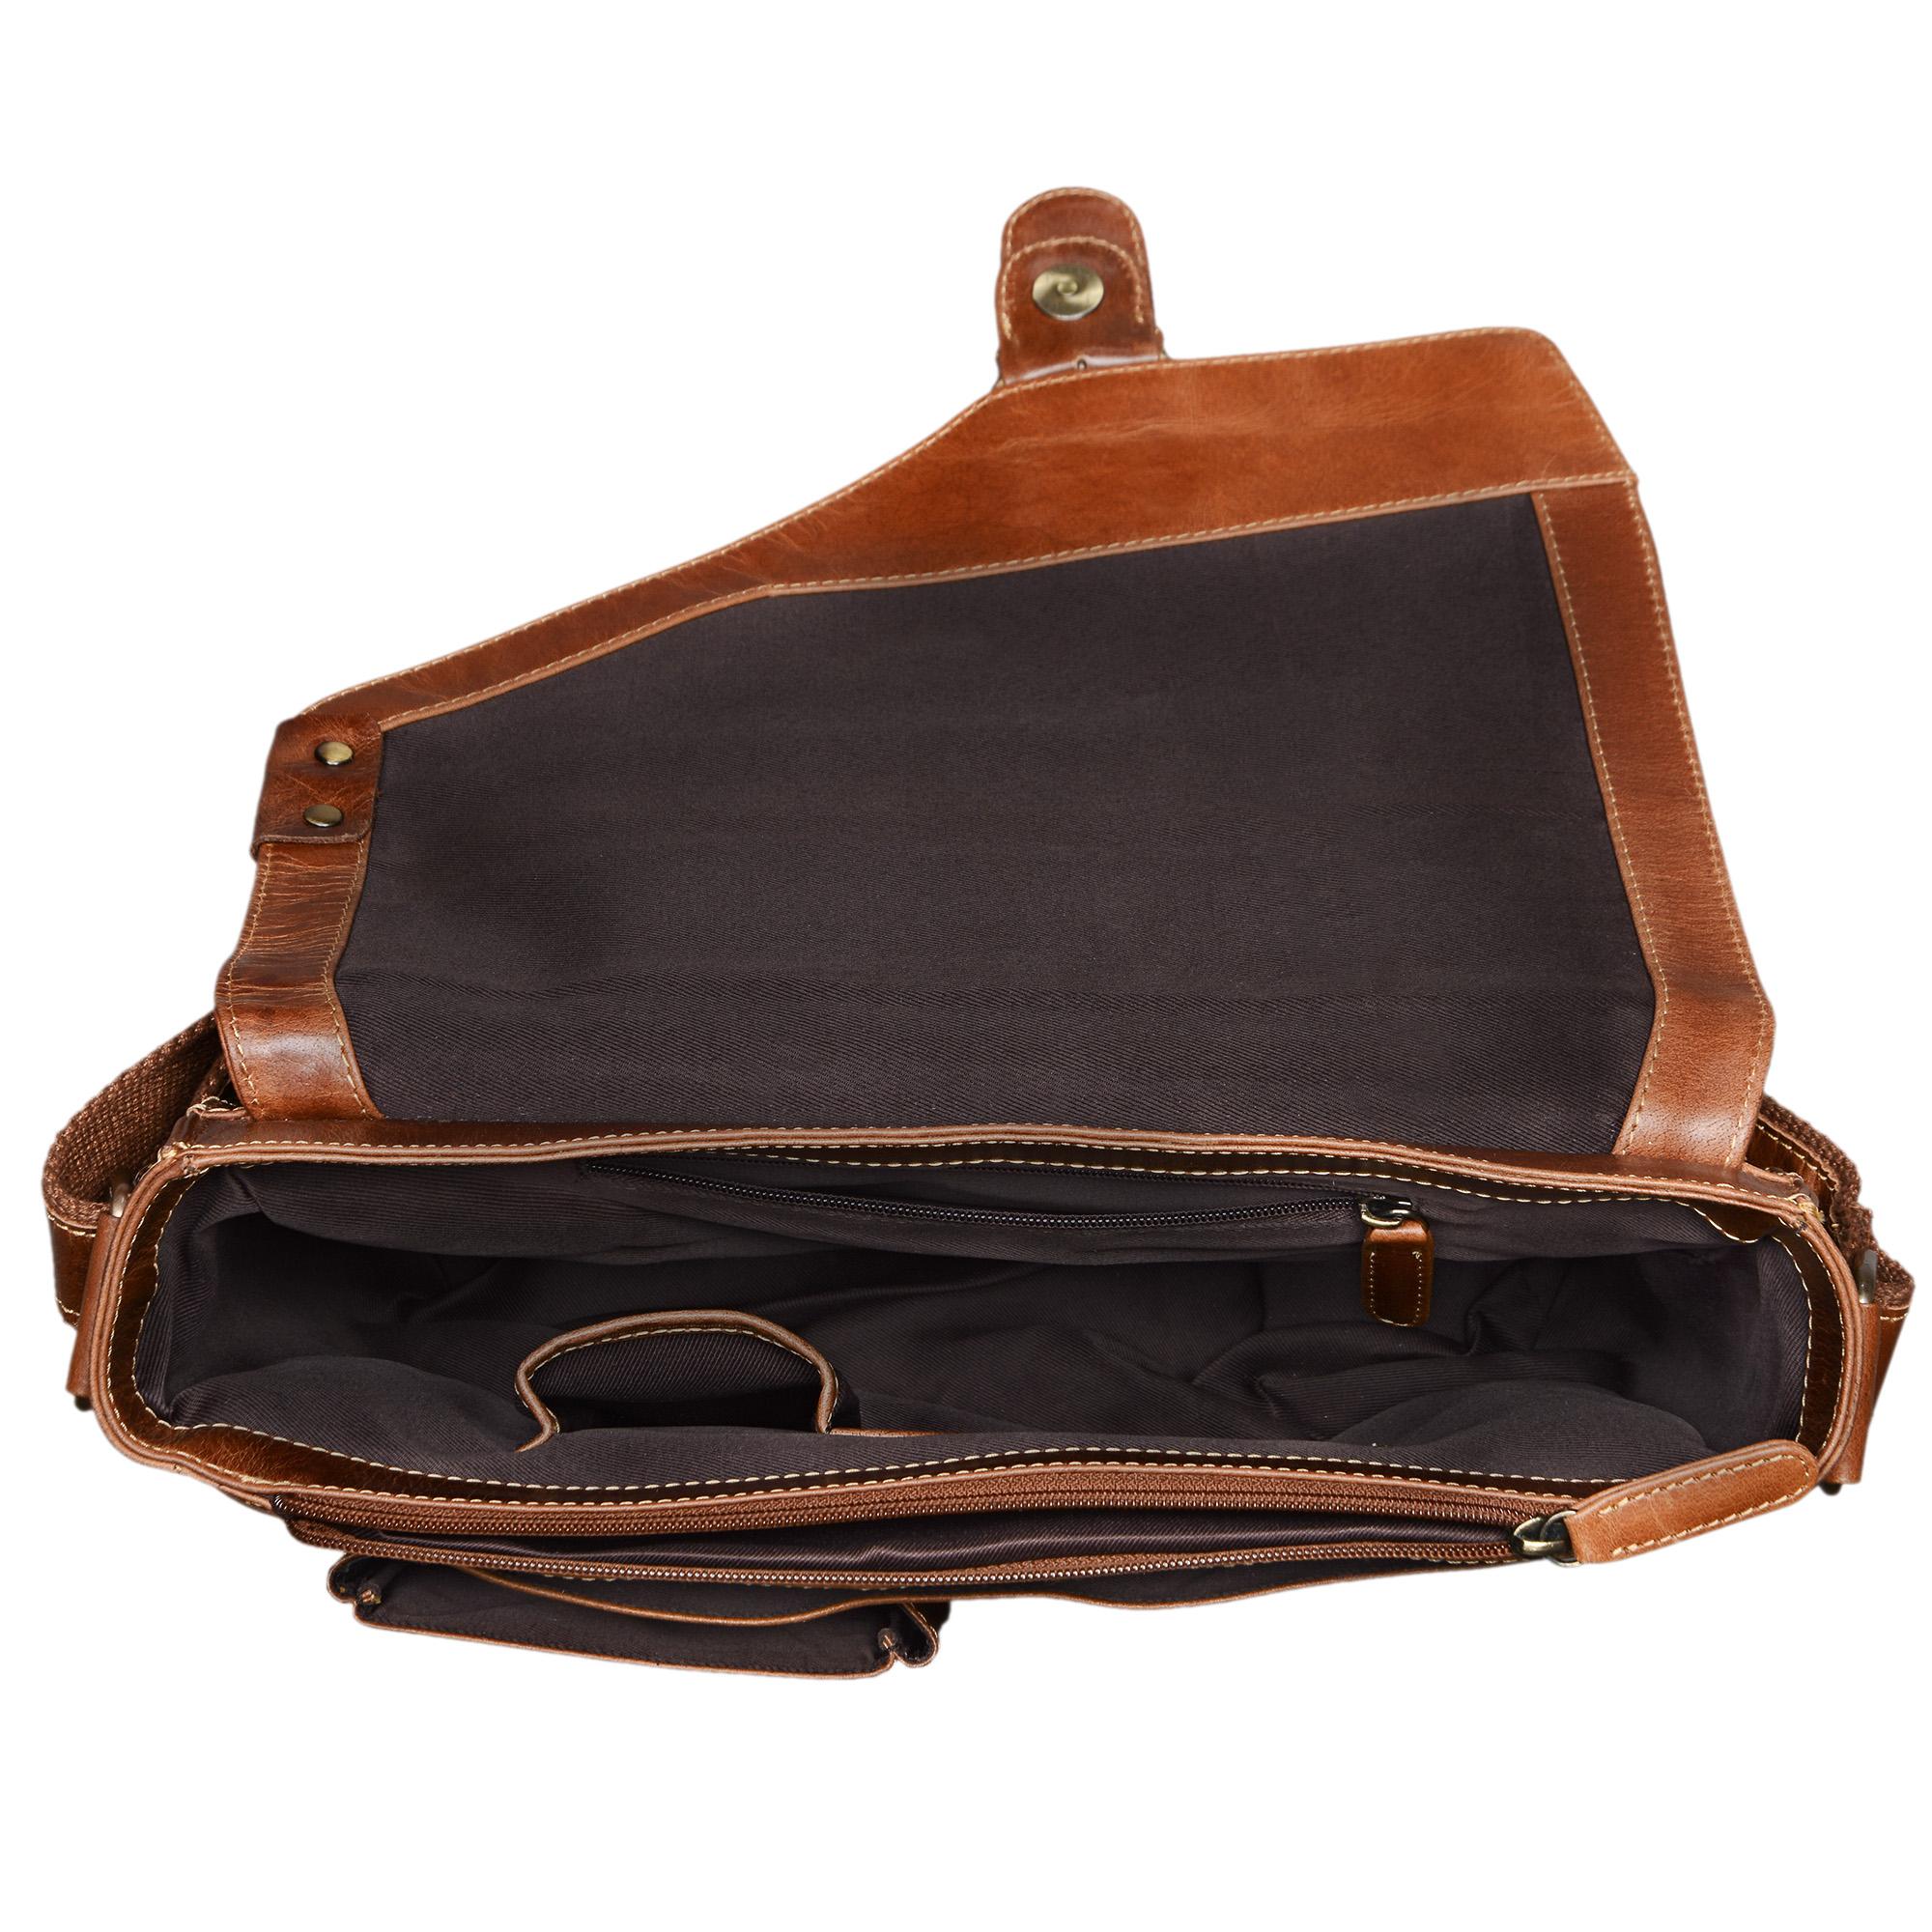 13,3 Zoll Vintage Laptoptasche Leder